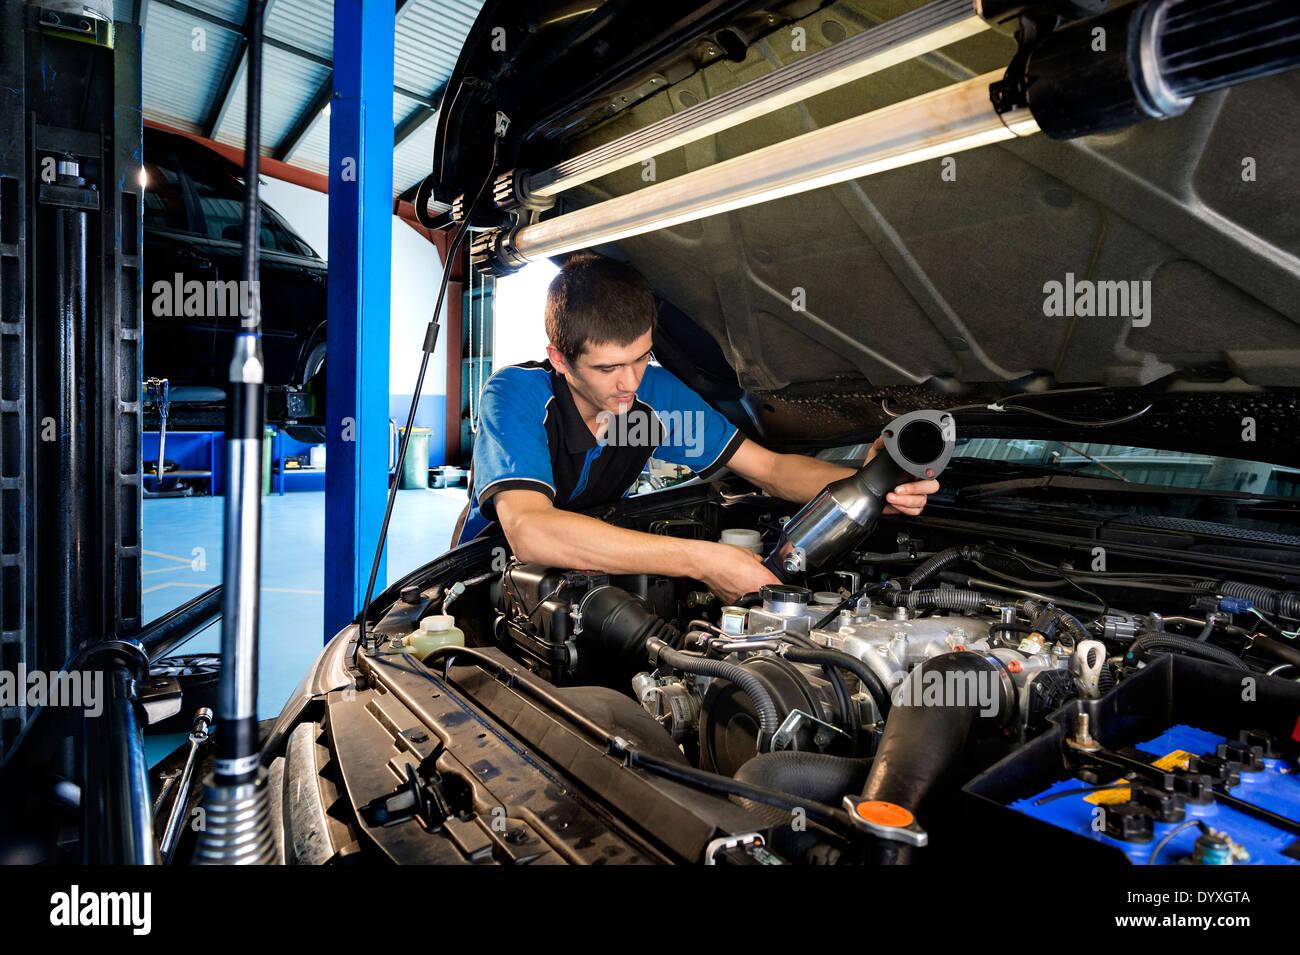 Apprentice mechanic under car hood - Stock Image